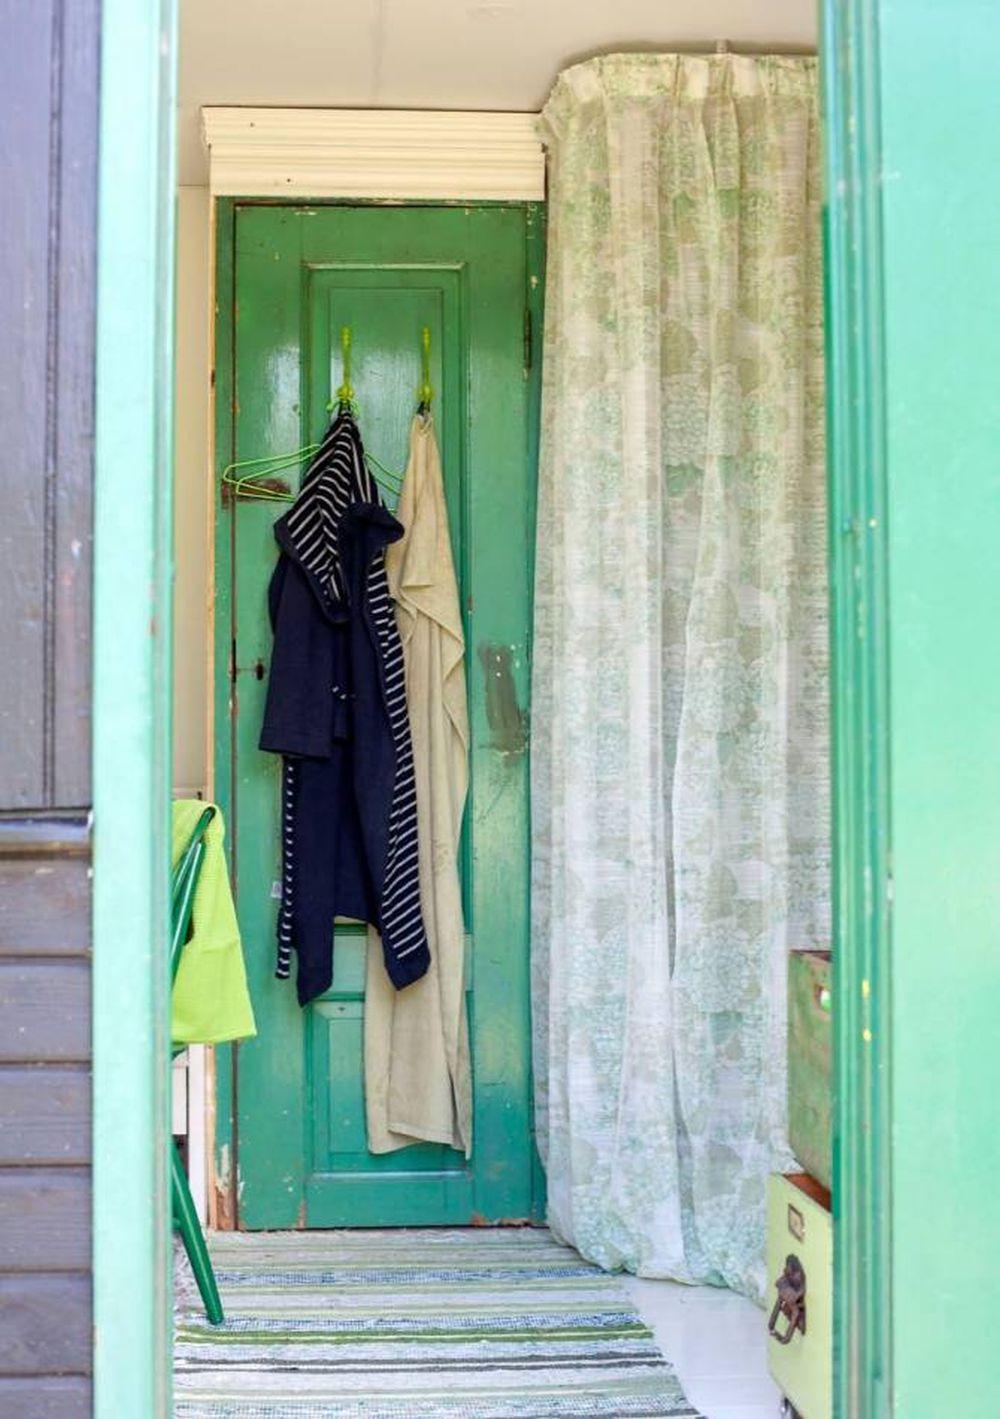 adelaparvu.com despre casa de vacanta pe roti, 18 mp, Suedia, Foto Minna Mercke-Schmidt (3)